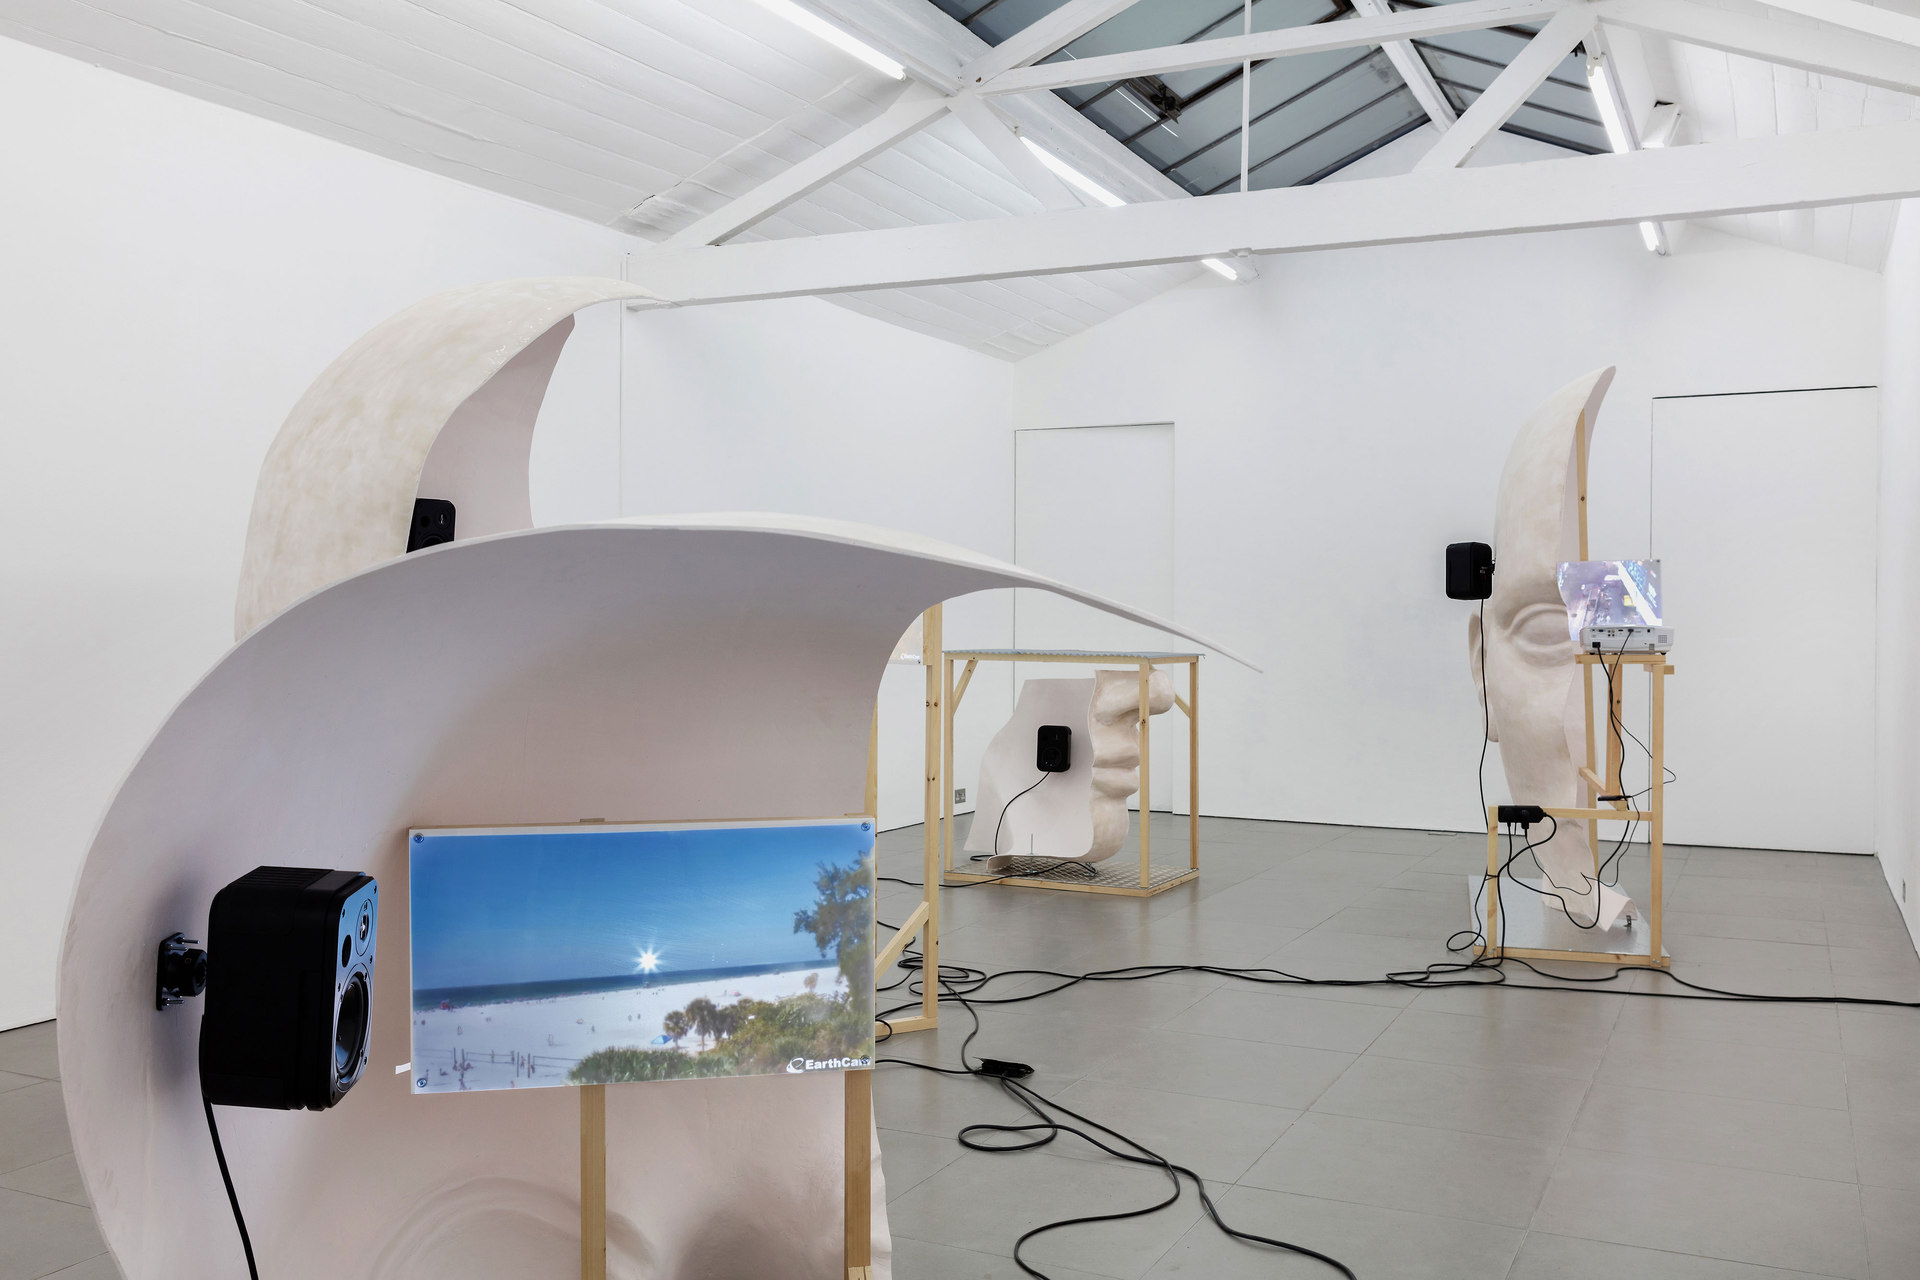 Anne de Vries, Submission, 2015, fibre glass resin, wood, perspex, metal, live stream webcams, four channel audio track: 16 mins 25 secs, dimensions variable